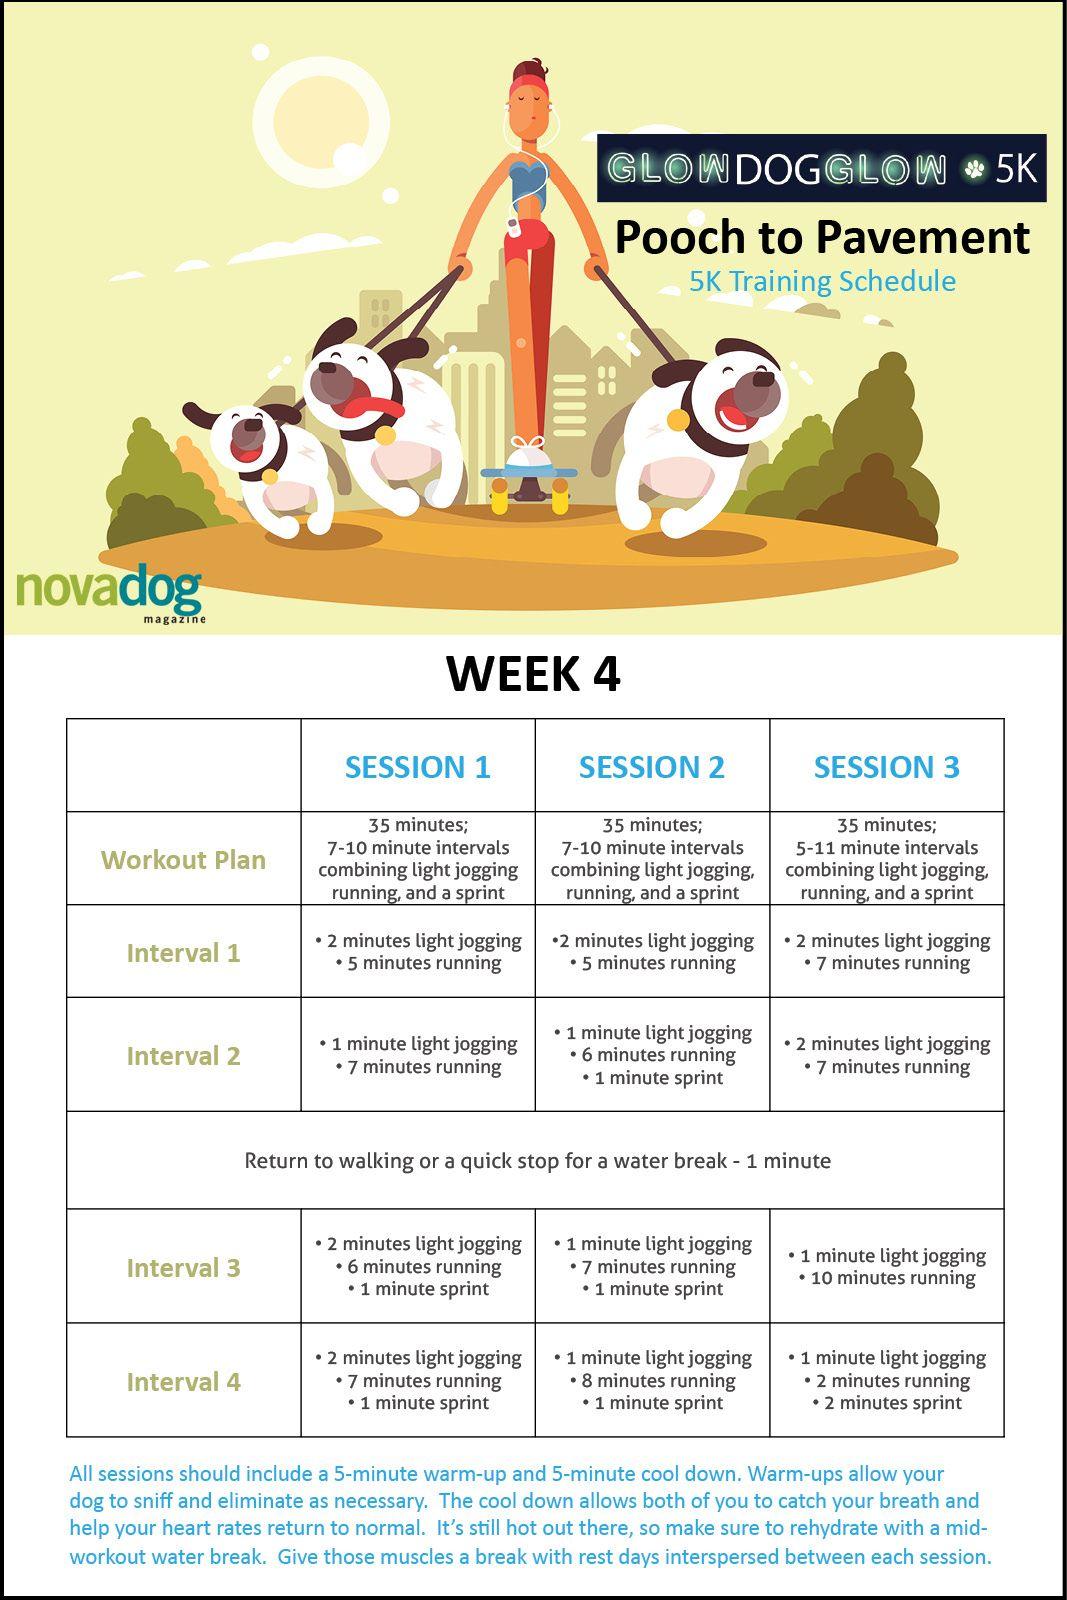 Pooch To Pavement 5k Training Schedule Week 4 5k Training